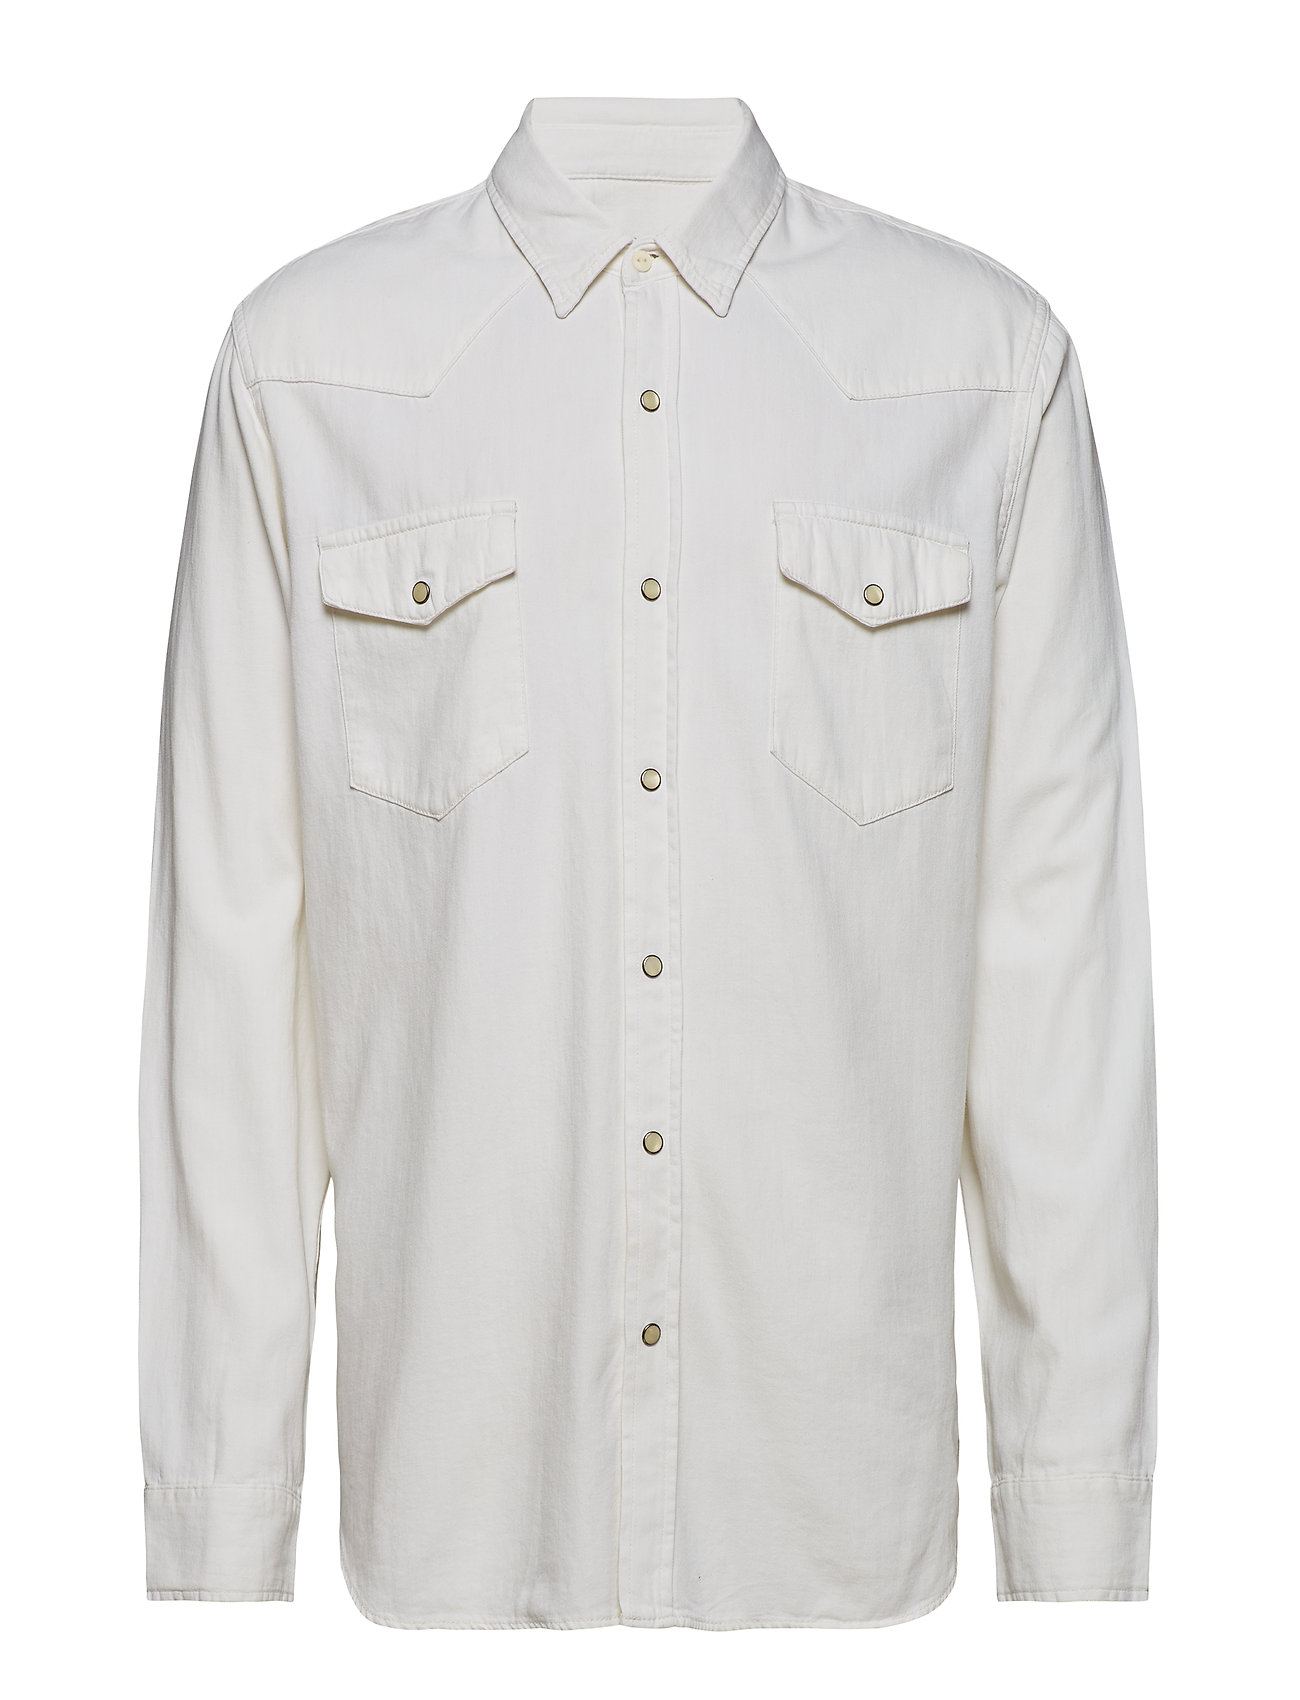 38d5b0d8 ECRU GAP Western Shirt Ecru casual skjorter for herre - Pashion.dk